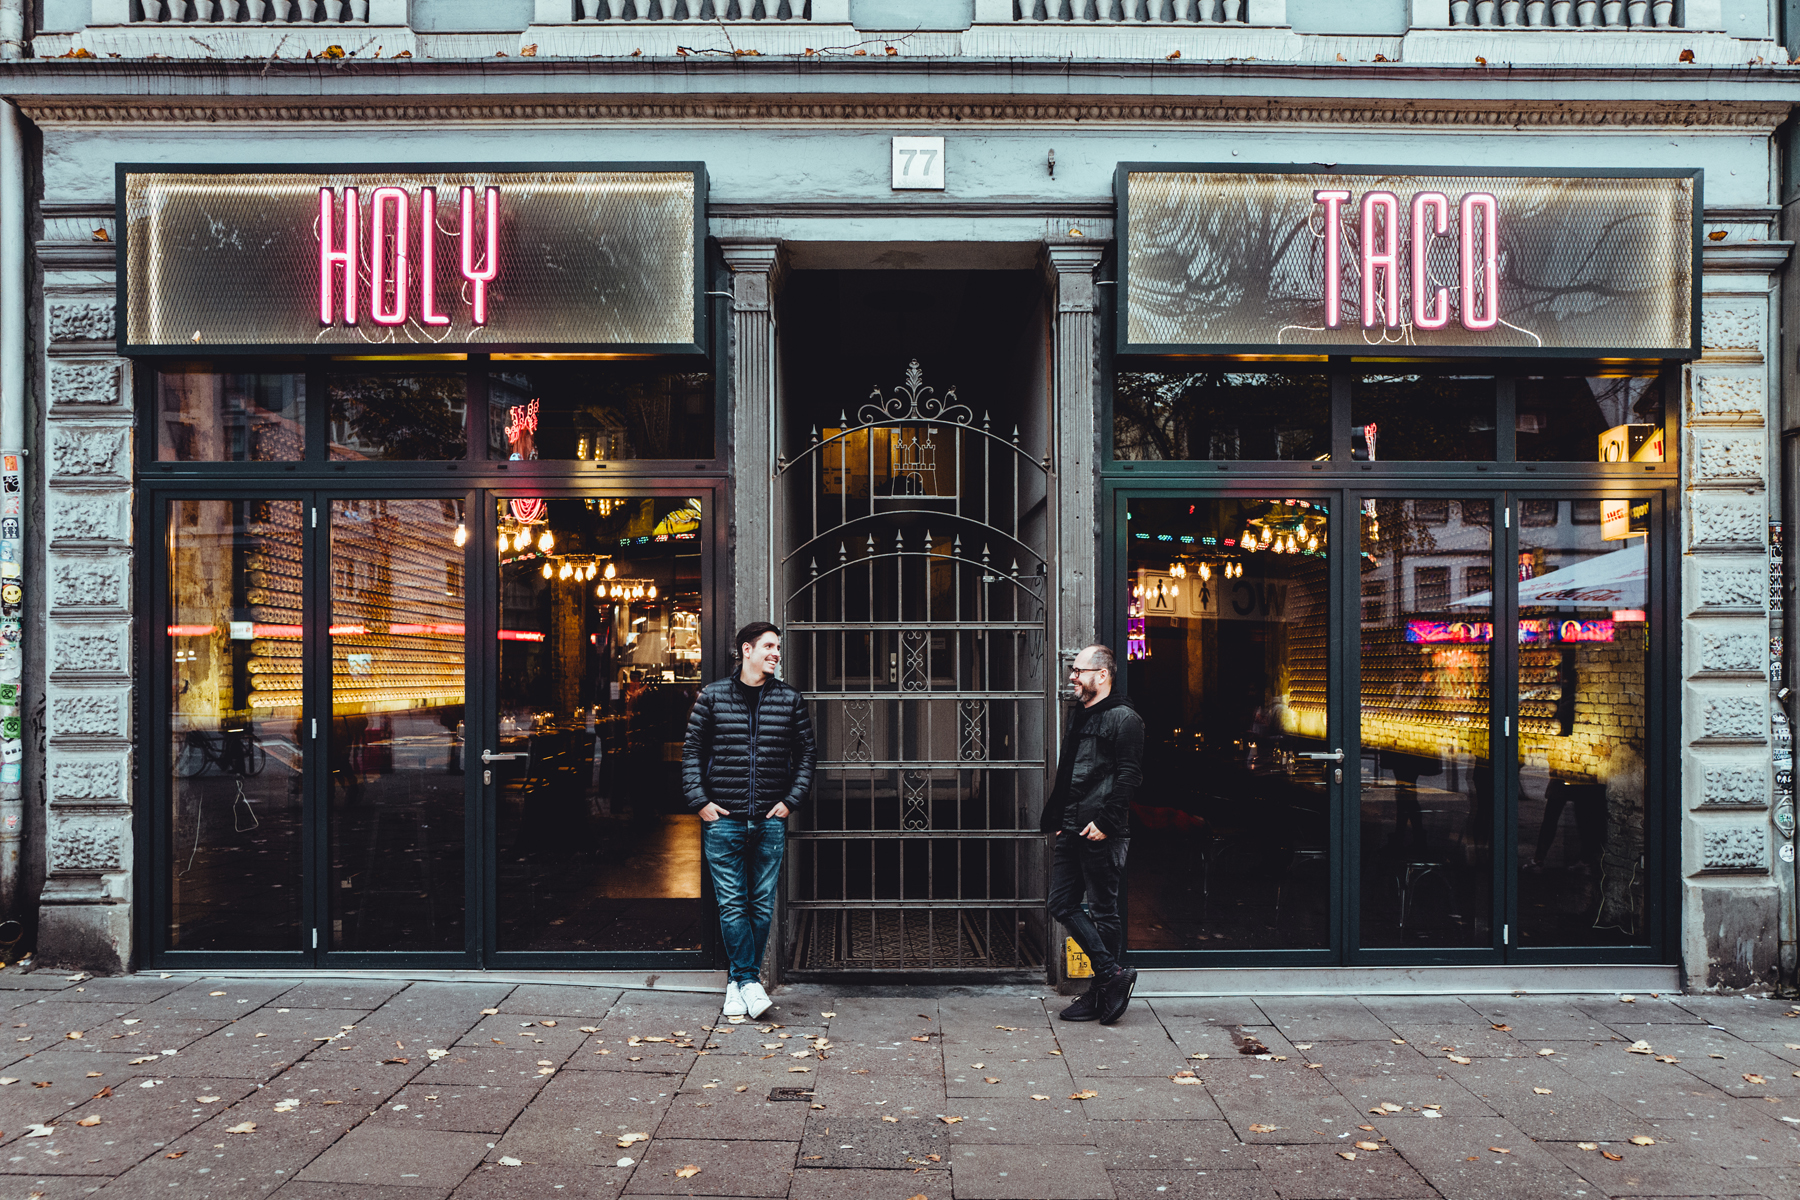 Geheimtipp Hamburg Essen & Trinken Bar Restaurant St Pauli Holy Taco Dahlina Sophie Kock 10